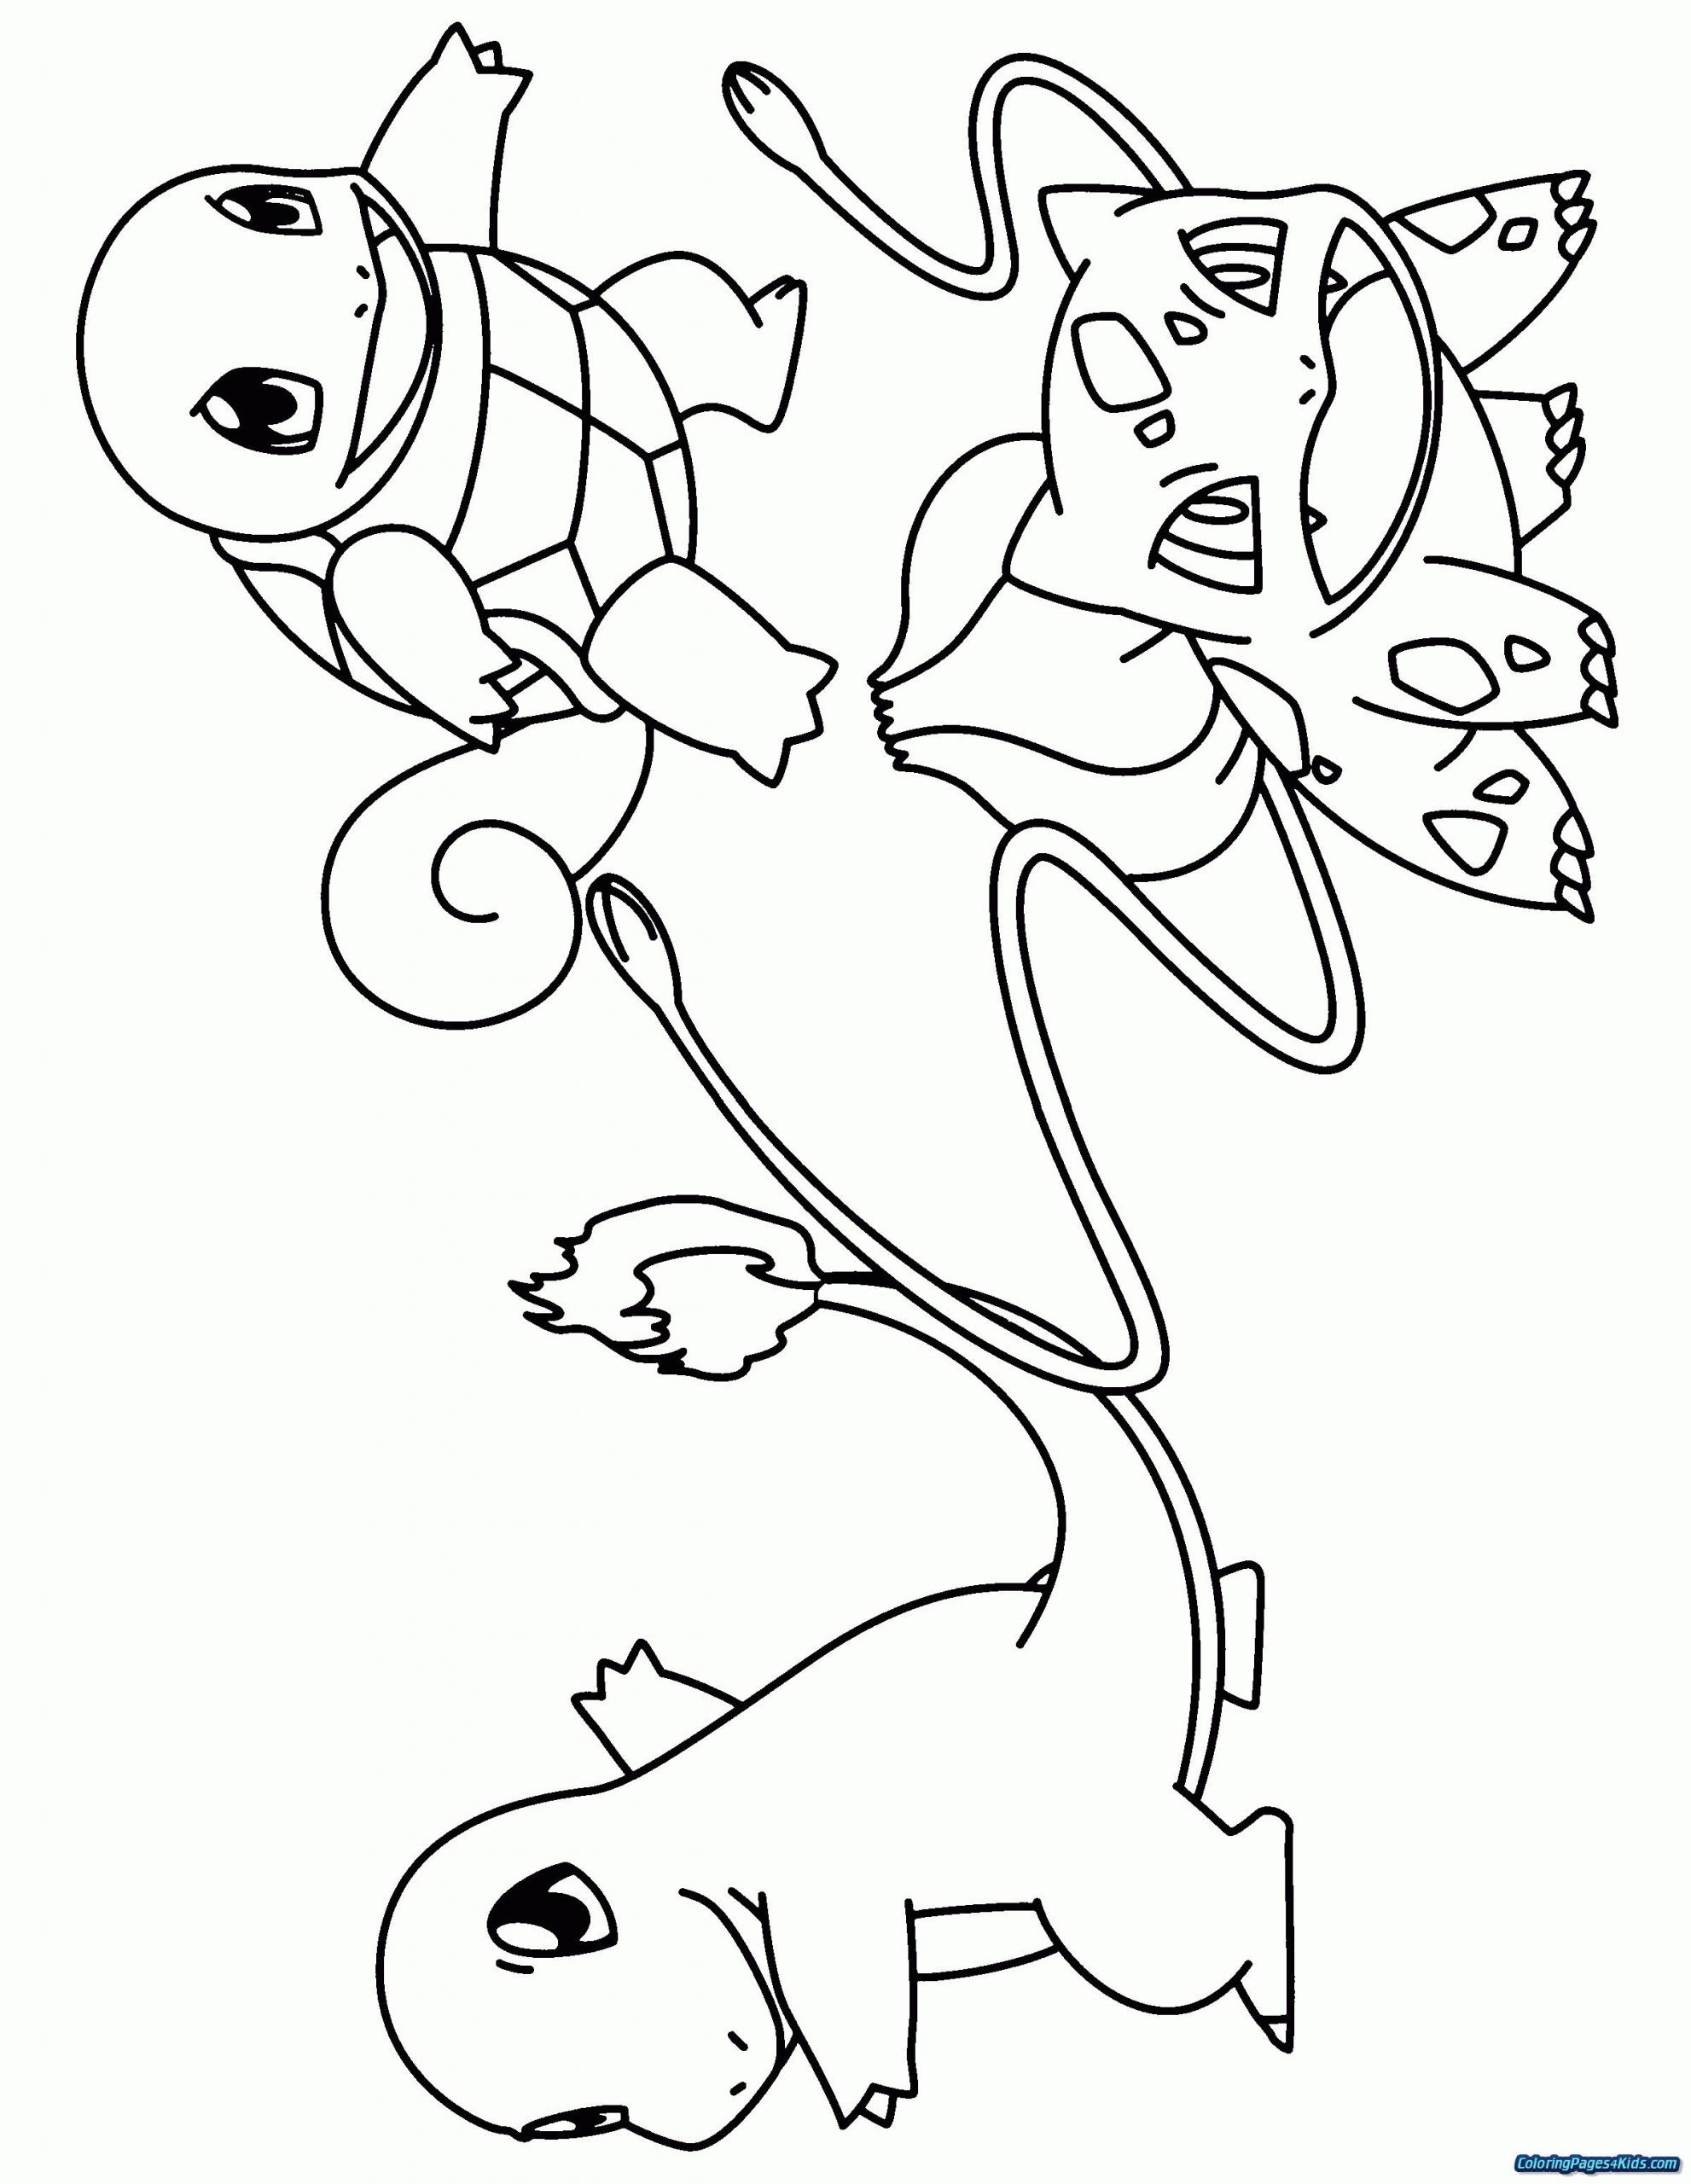 Pokemon Charizard Coloring Page Youngandtae Com In 2020 Pokemon Coloring Pages Pikachu Coloring Page Pokemon Coloring Sheets